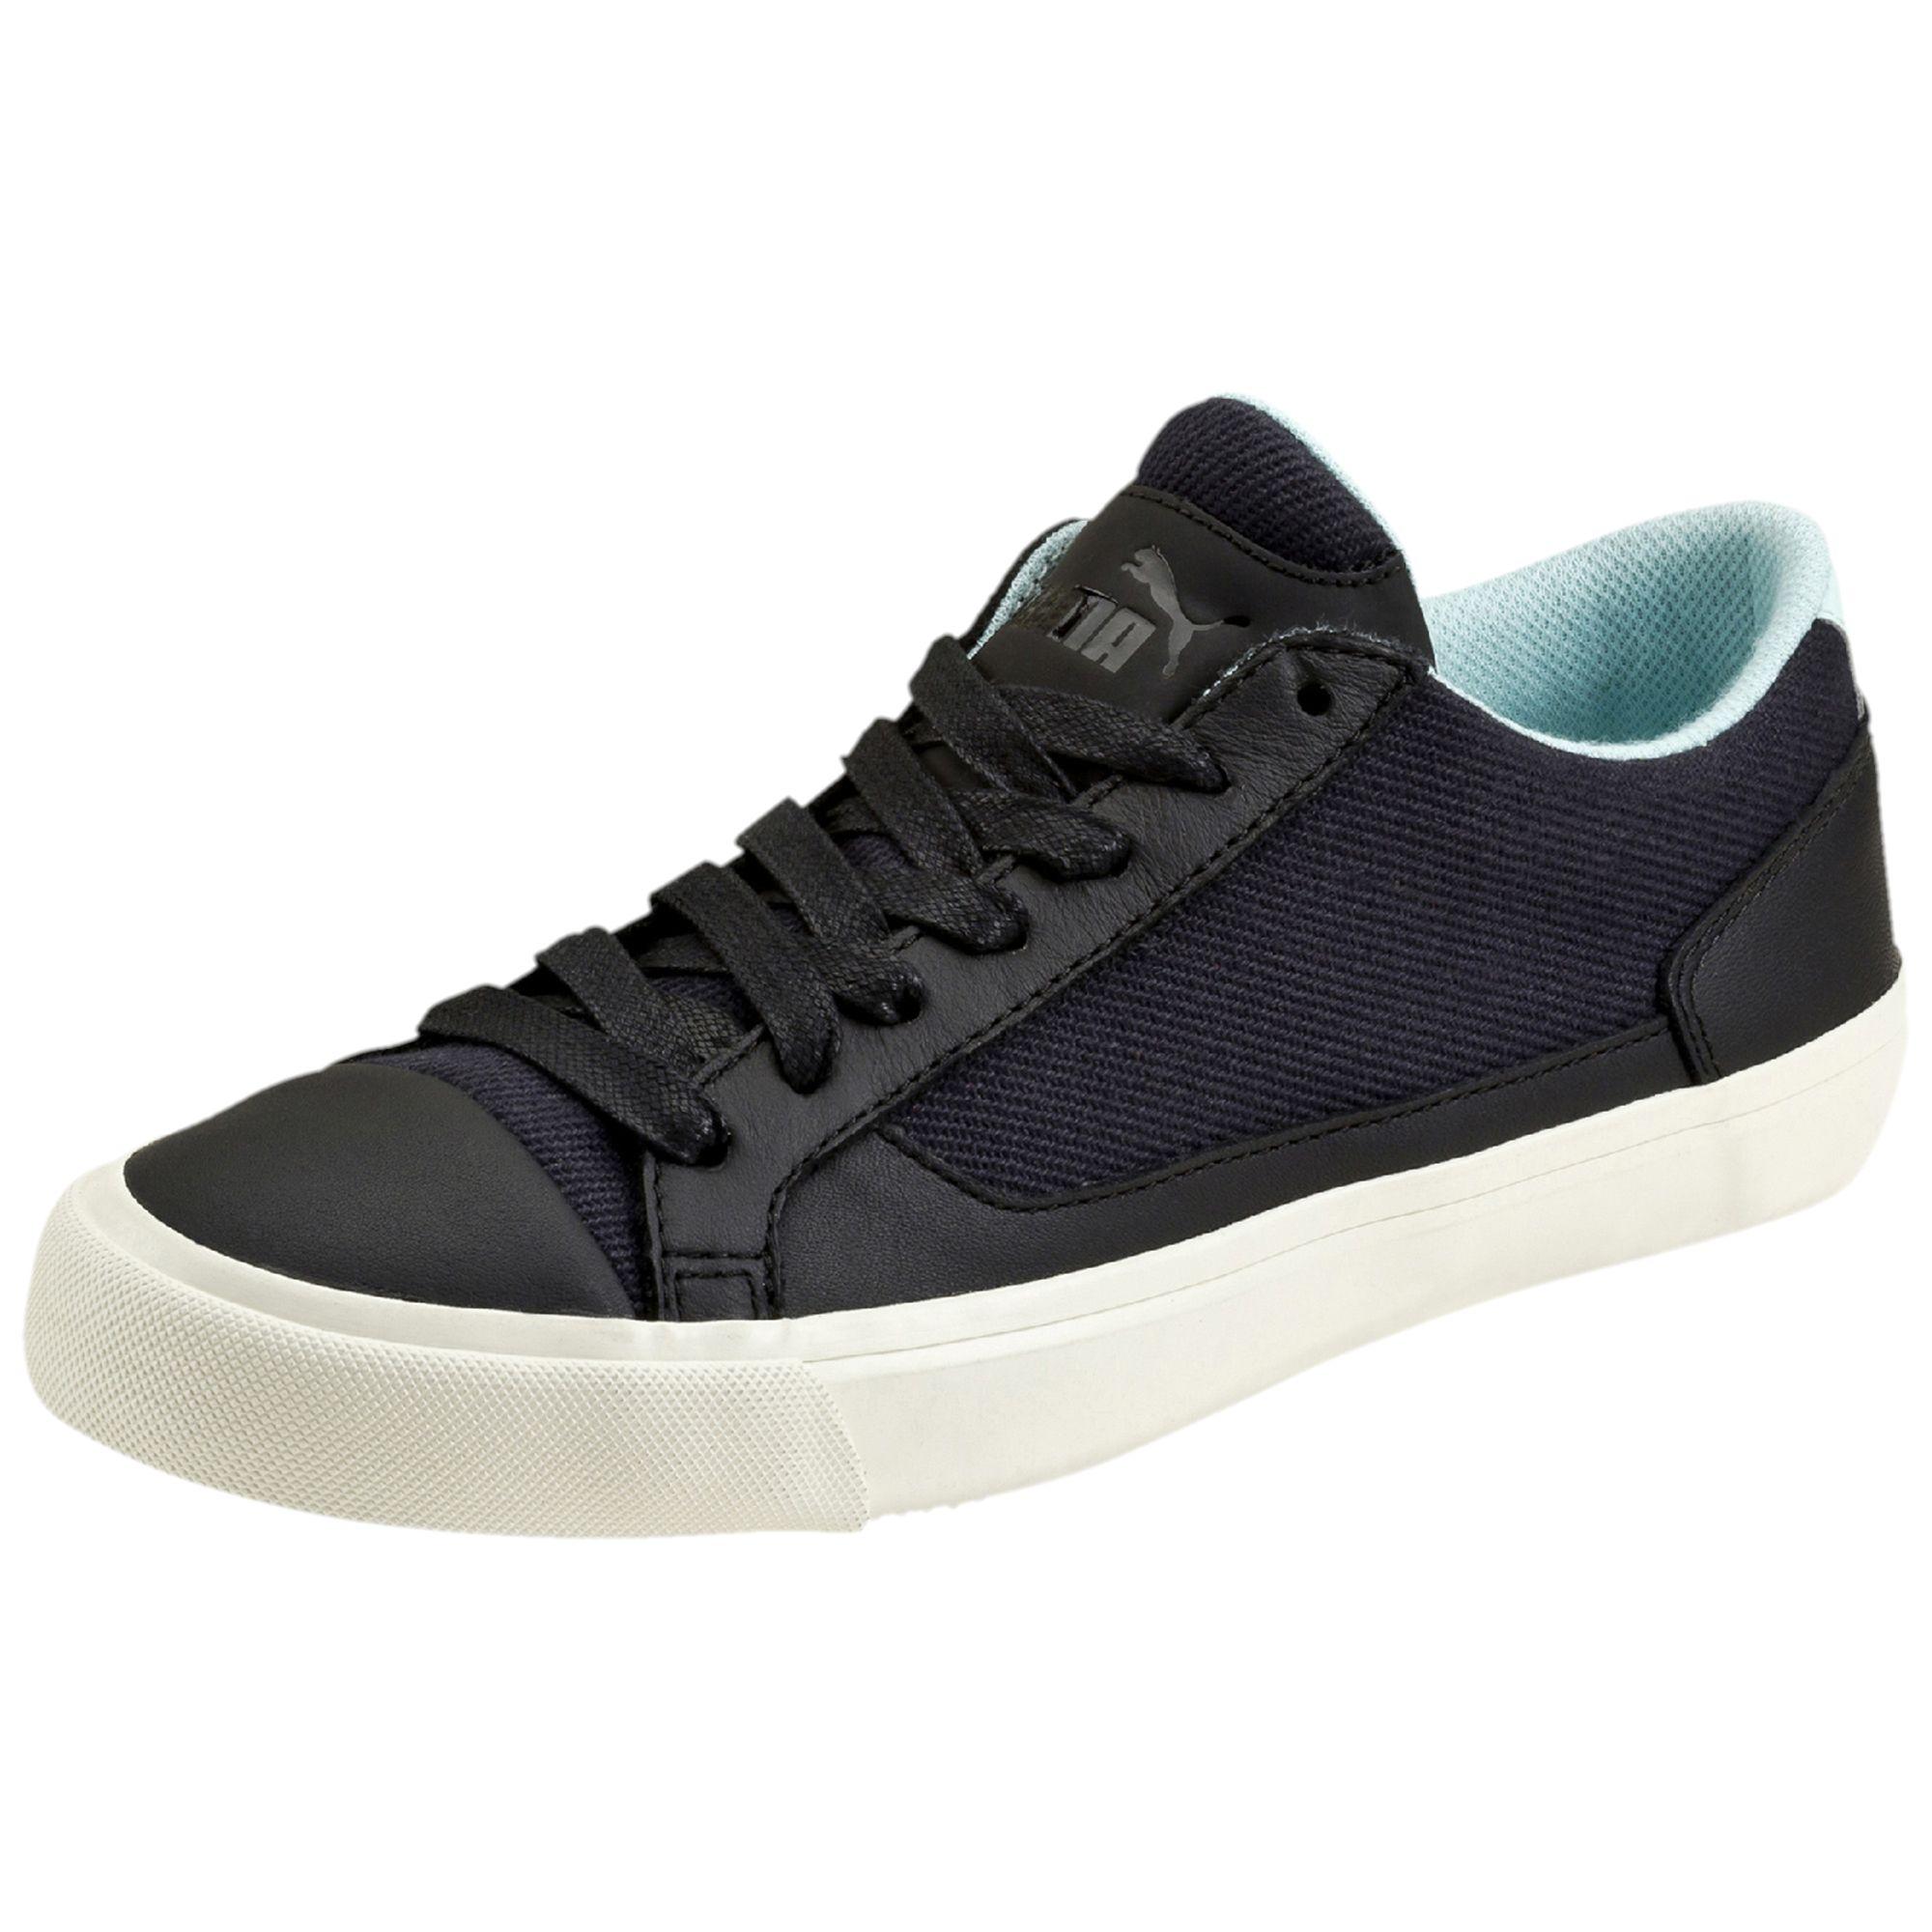 PUMA Alexander McQueen Rush Trainers Footwear Sneakers ...